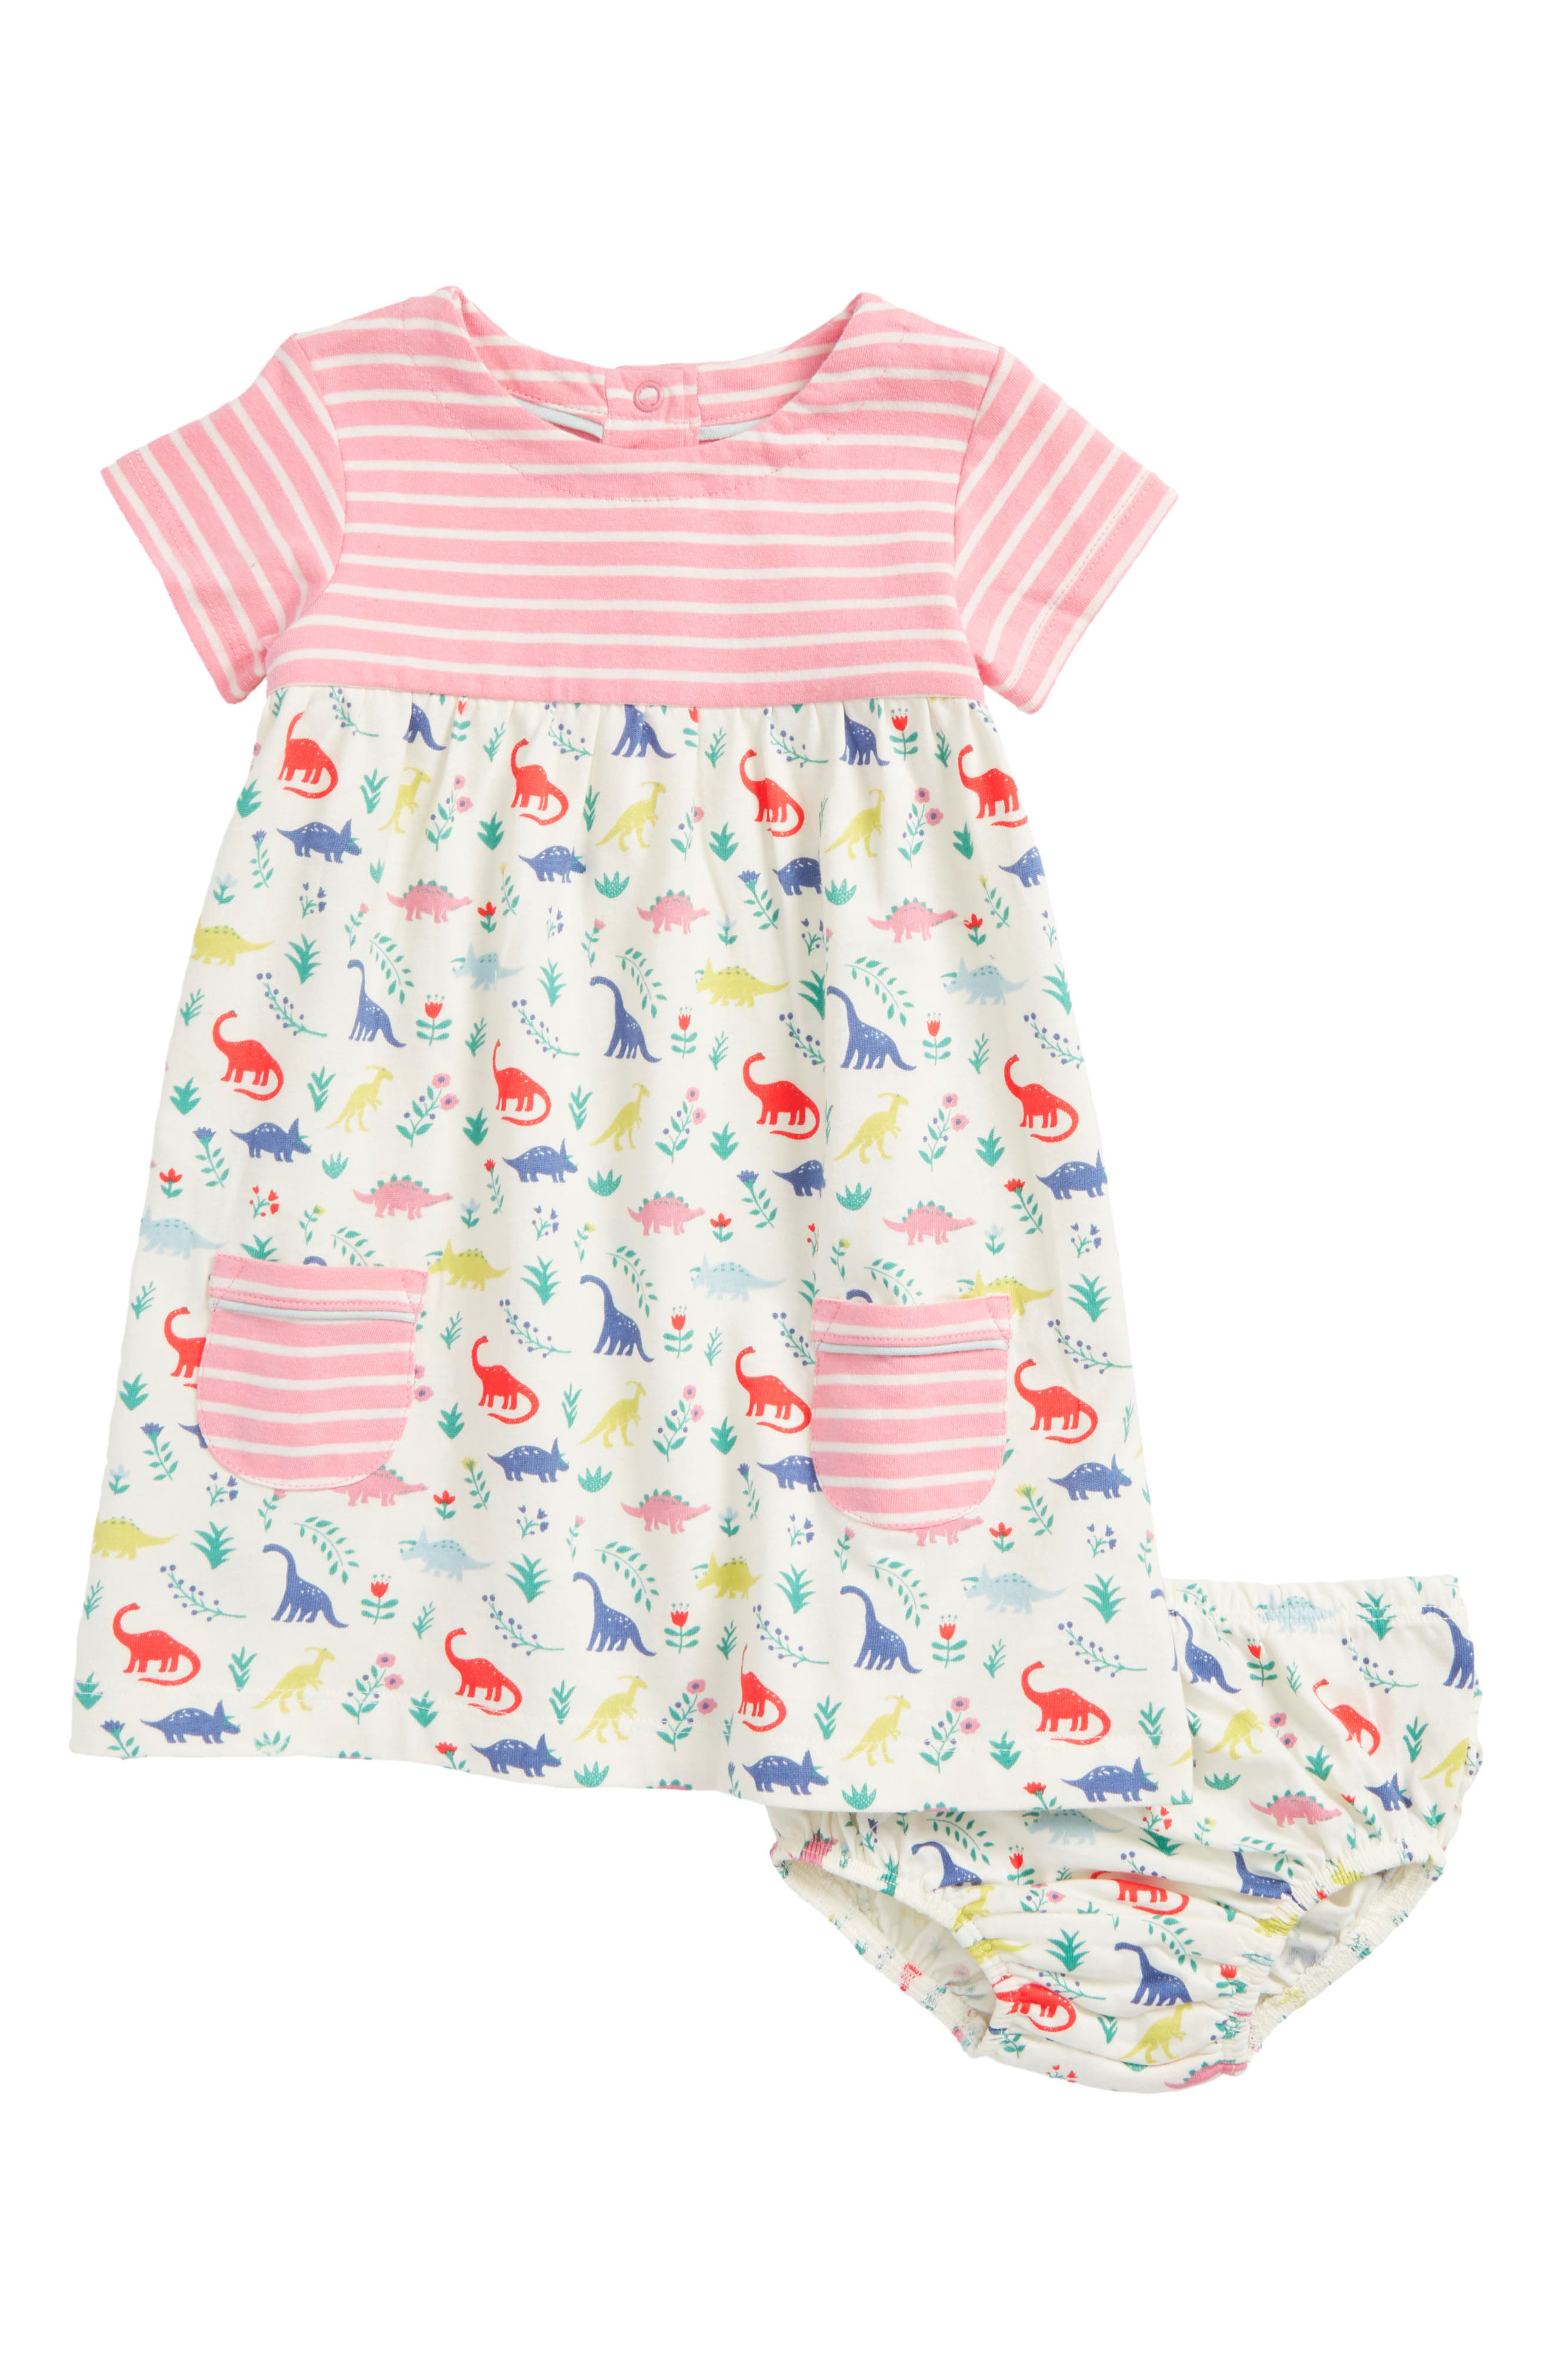 Main Image - Mini Boden Hotchpotch Jersey Dress (Baby Girls & Toddler Girls)